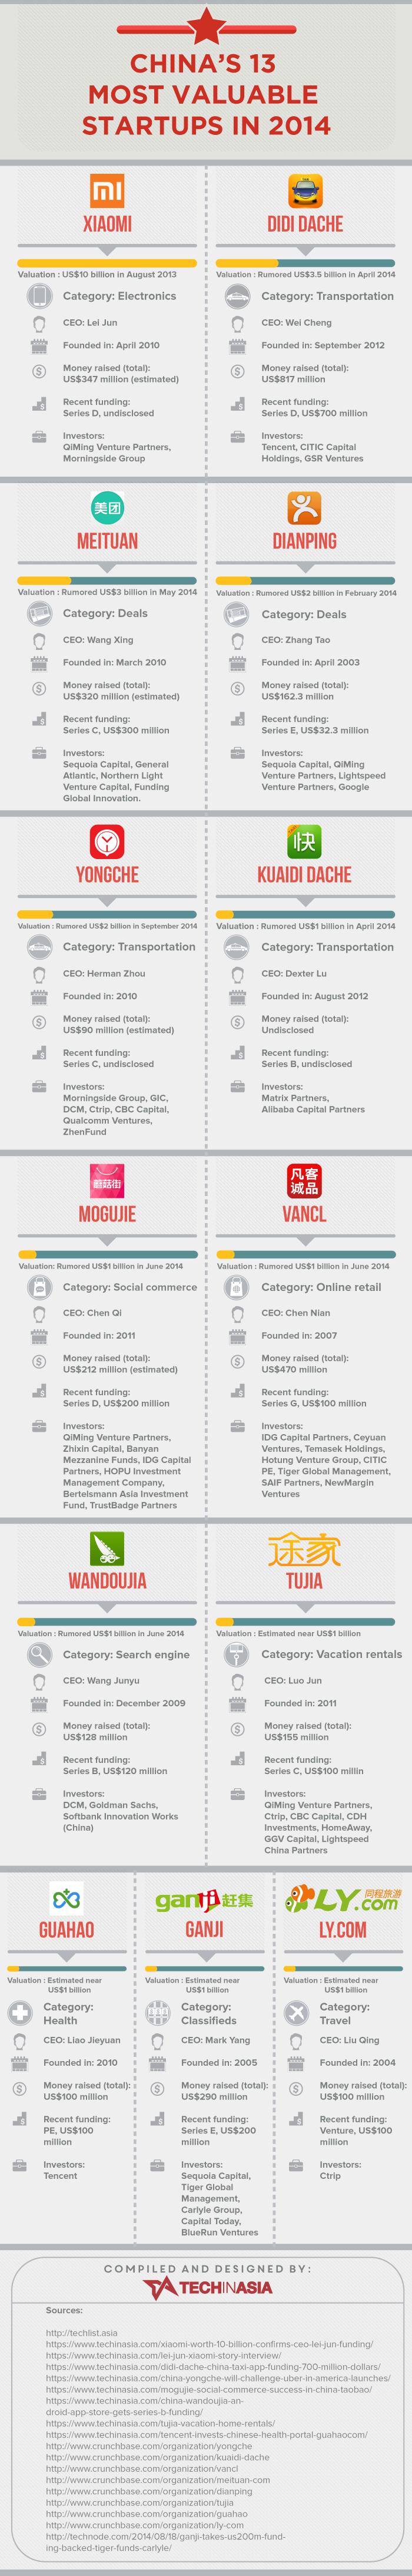 startups-chinas-2014